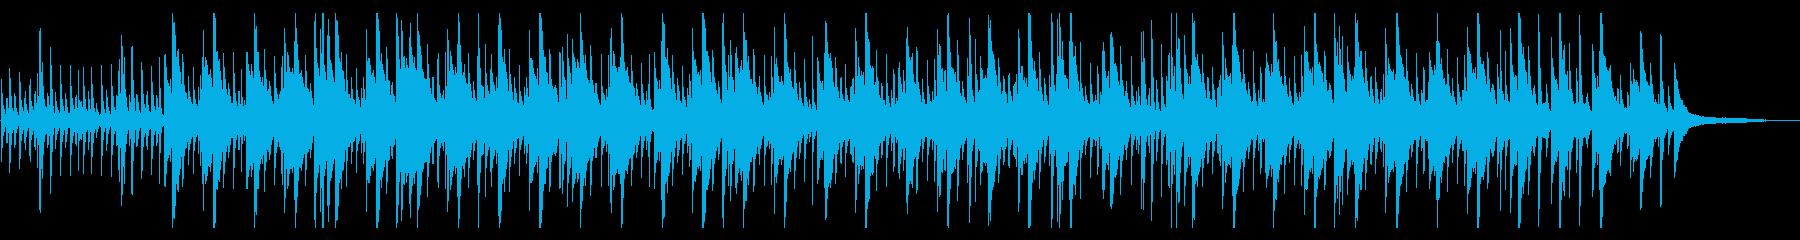 CMやVPにピアノソロおしゃれジャズ和音の再生済みの波形